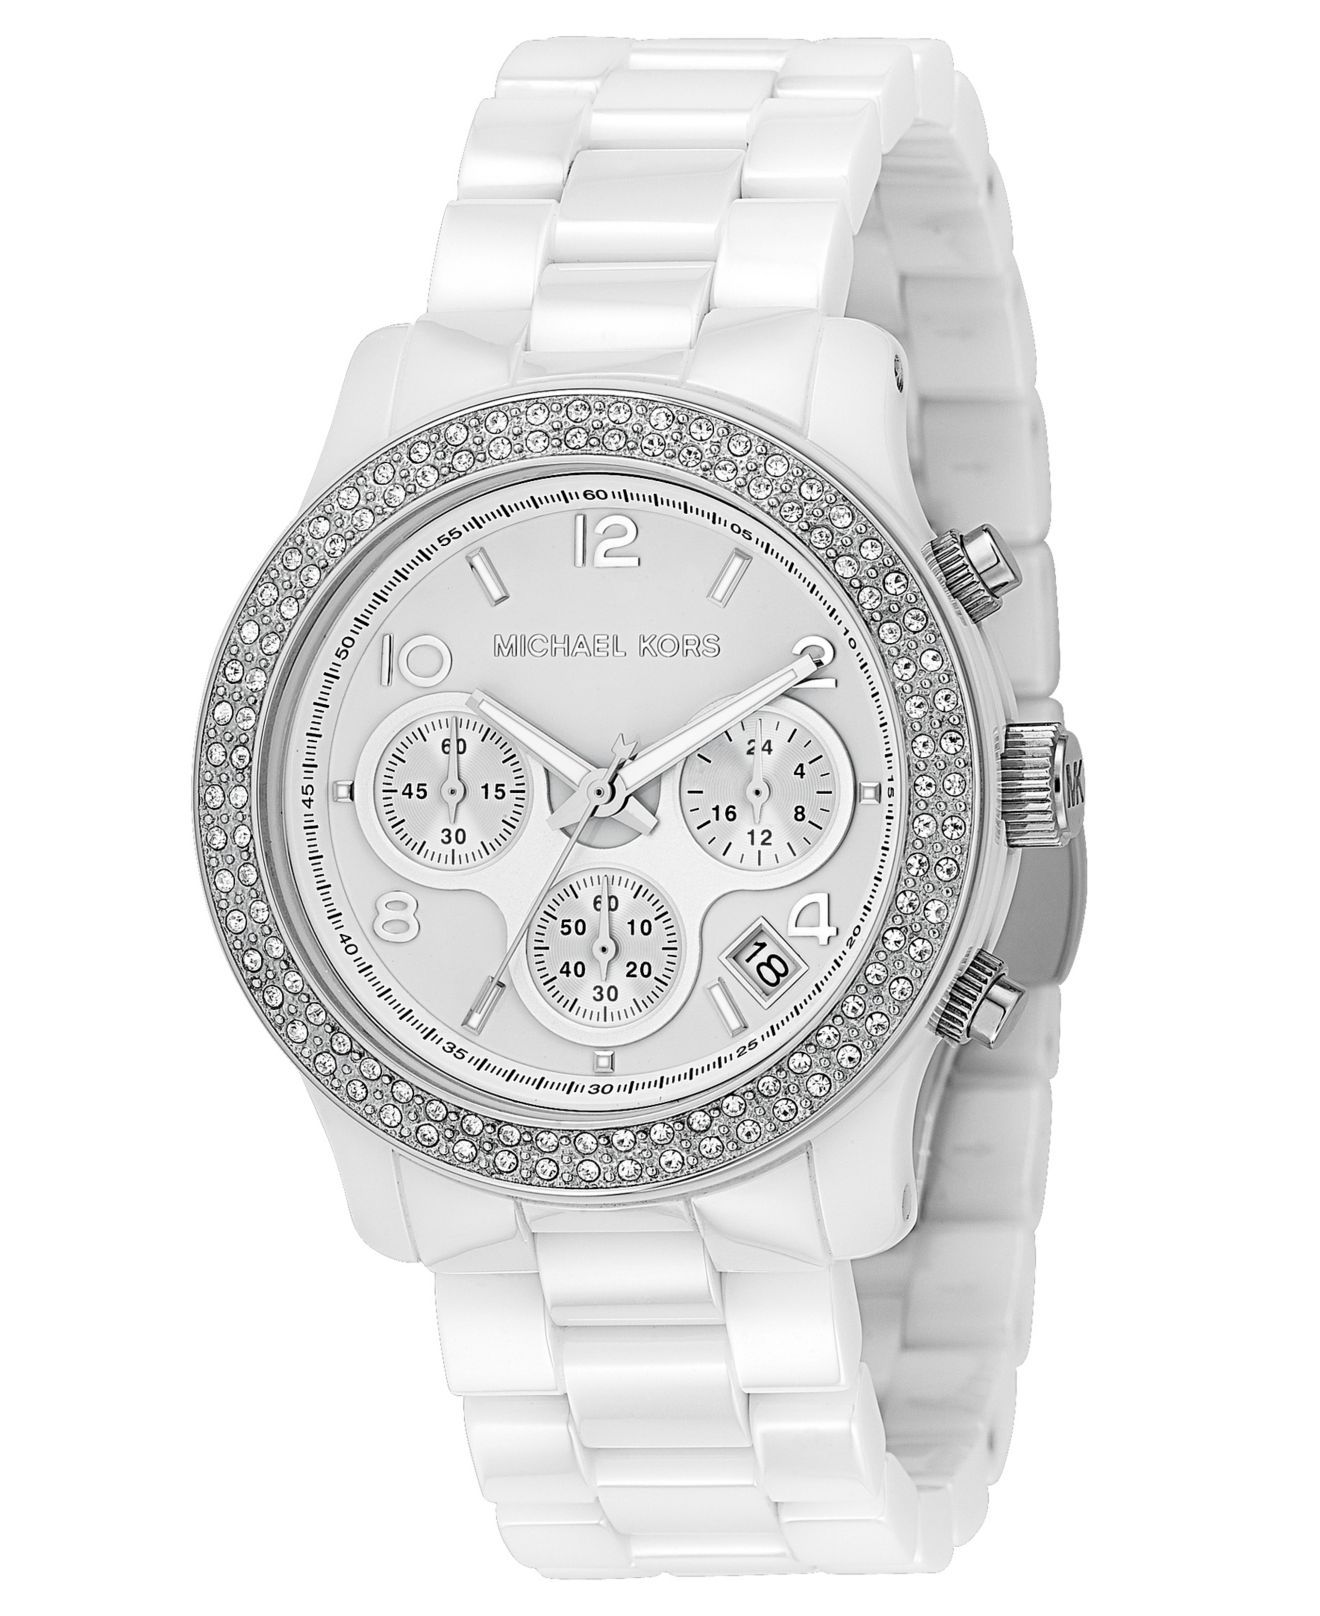 Michael Kors Watch Women S Chronograph Runway White Ceramic Bracelet 31mm Mk5188 For Her Jewelr Watches Women Michael Kors Michael Kors Watch Michael Kors